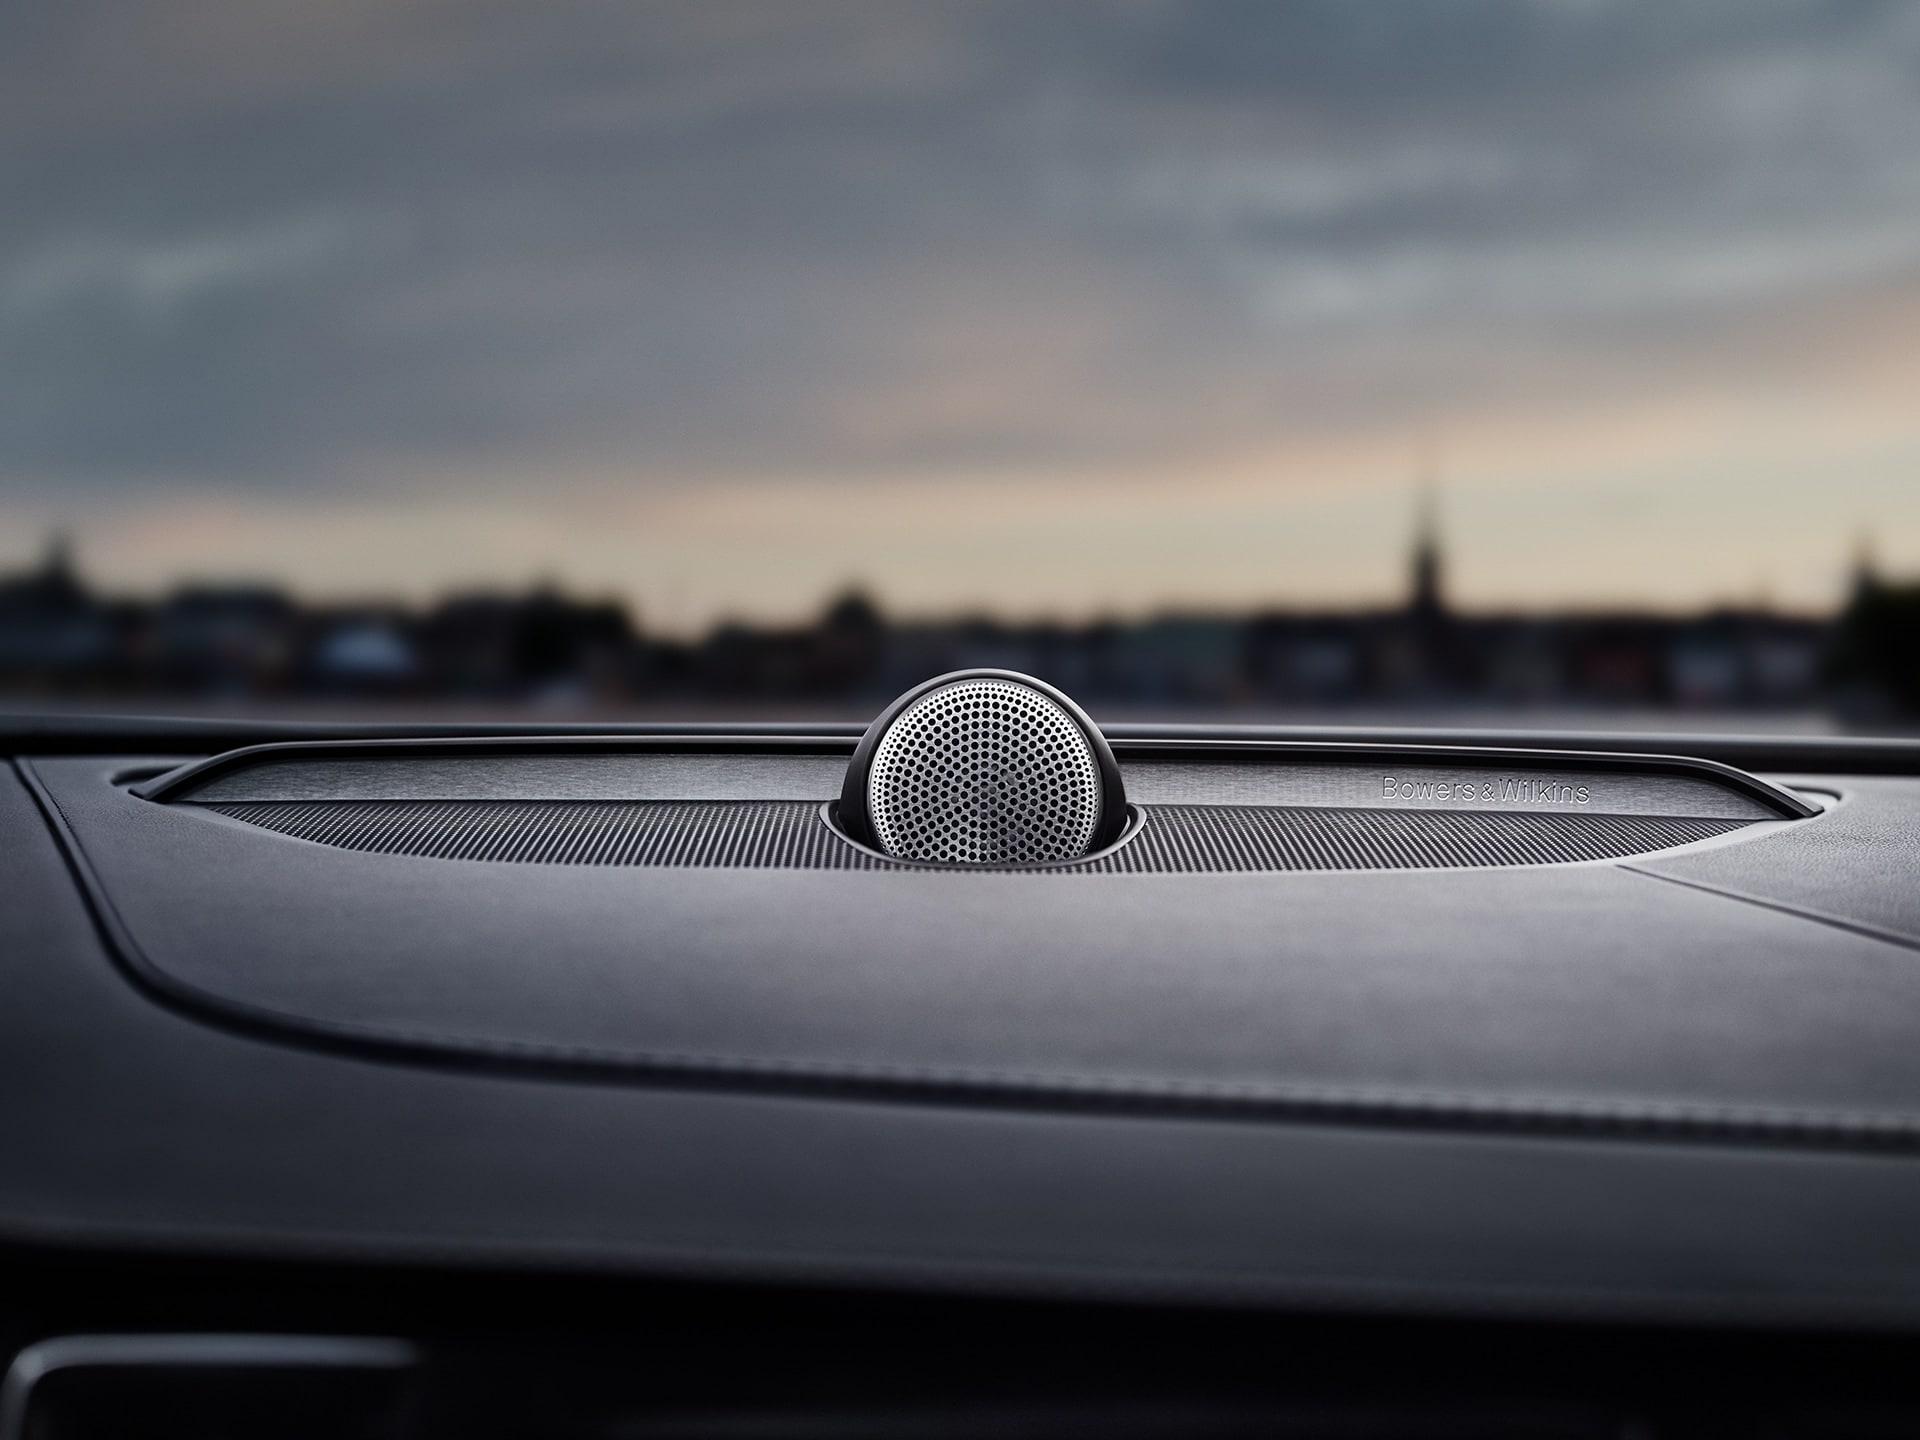 Bowers & Wilkins speakers inside a Volvo XC90.